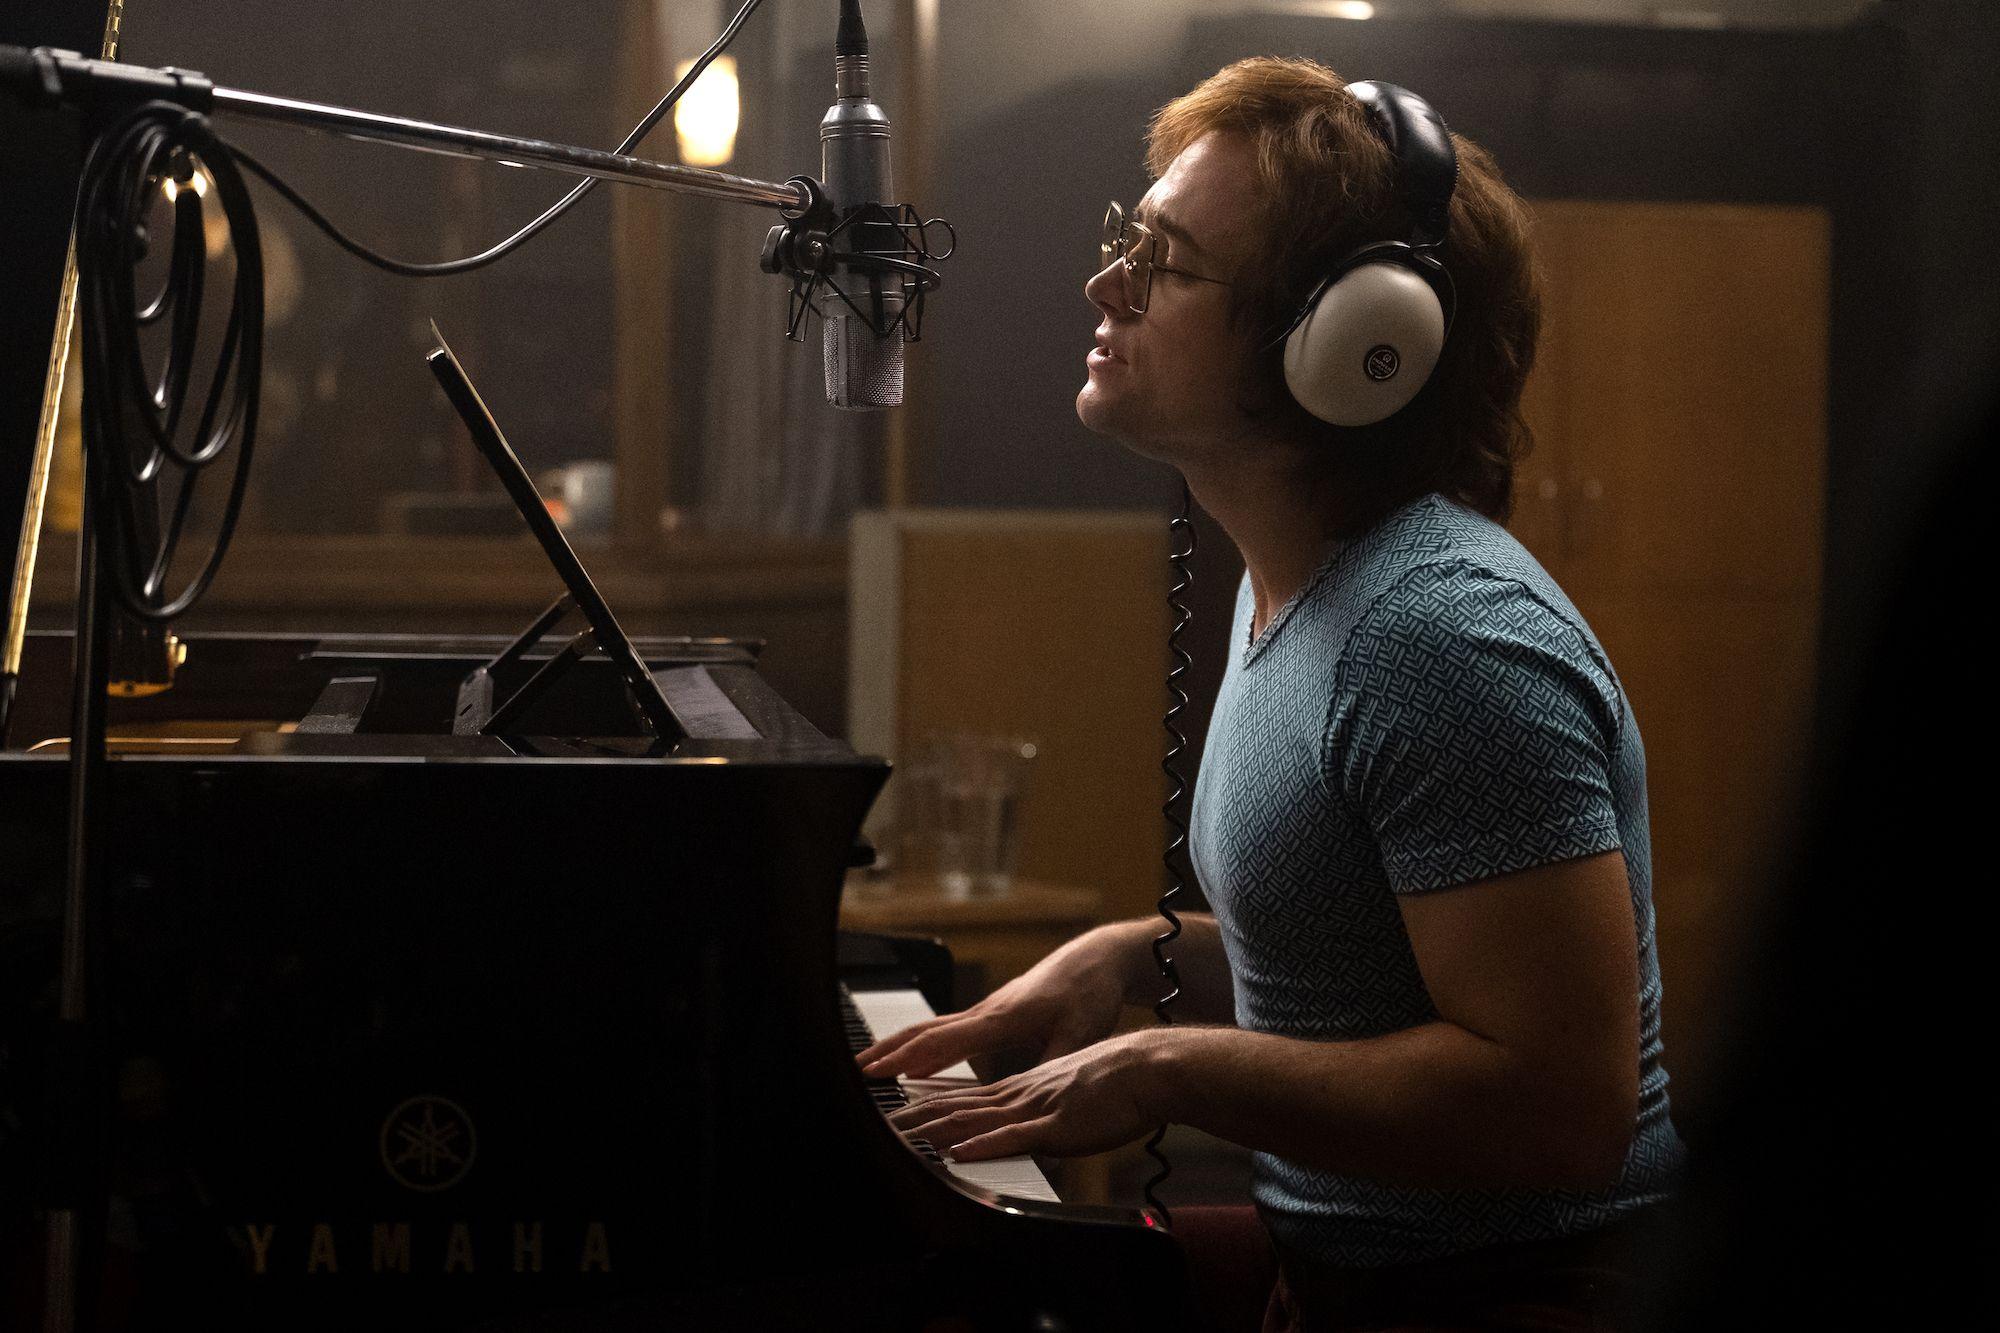 Rocketman Deleted Scene Has Elton John Confronting His Addiction